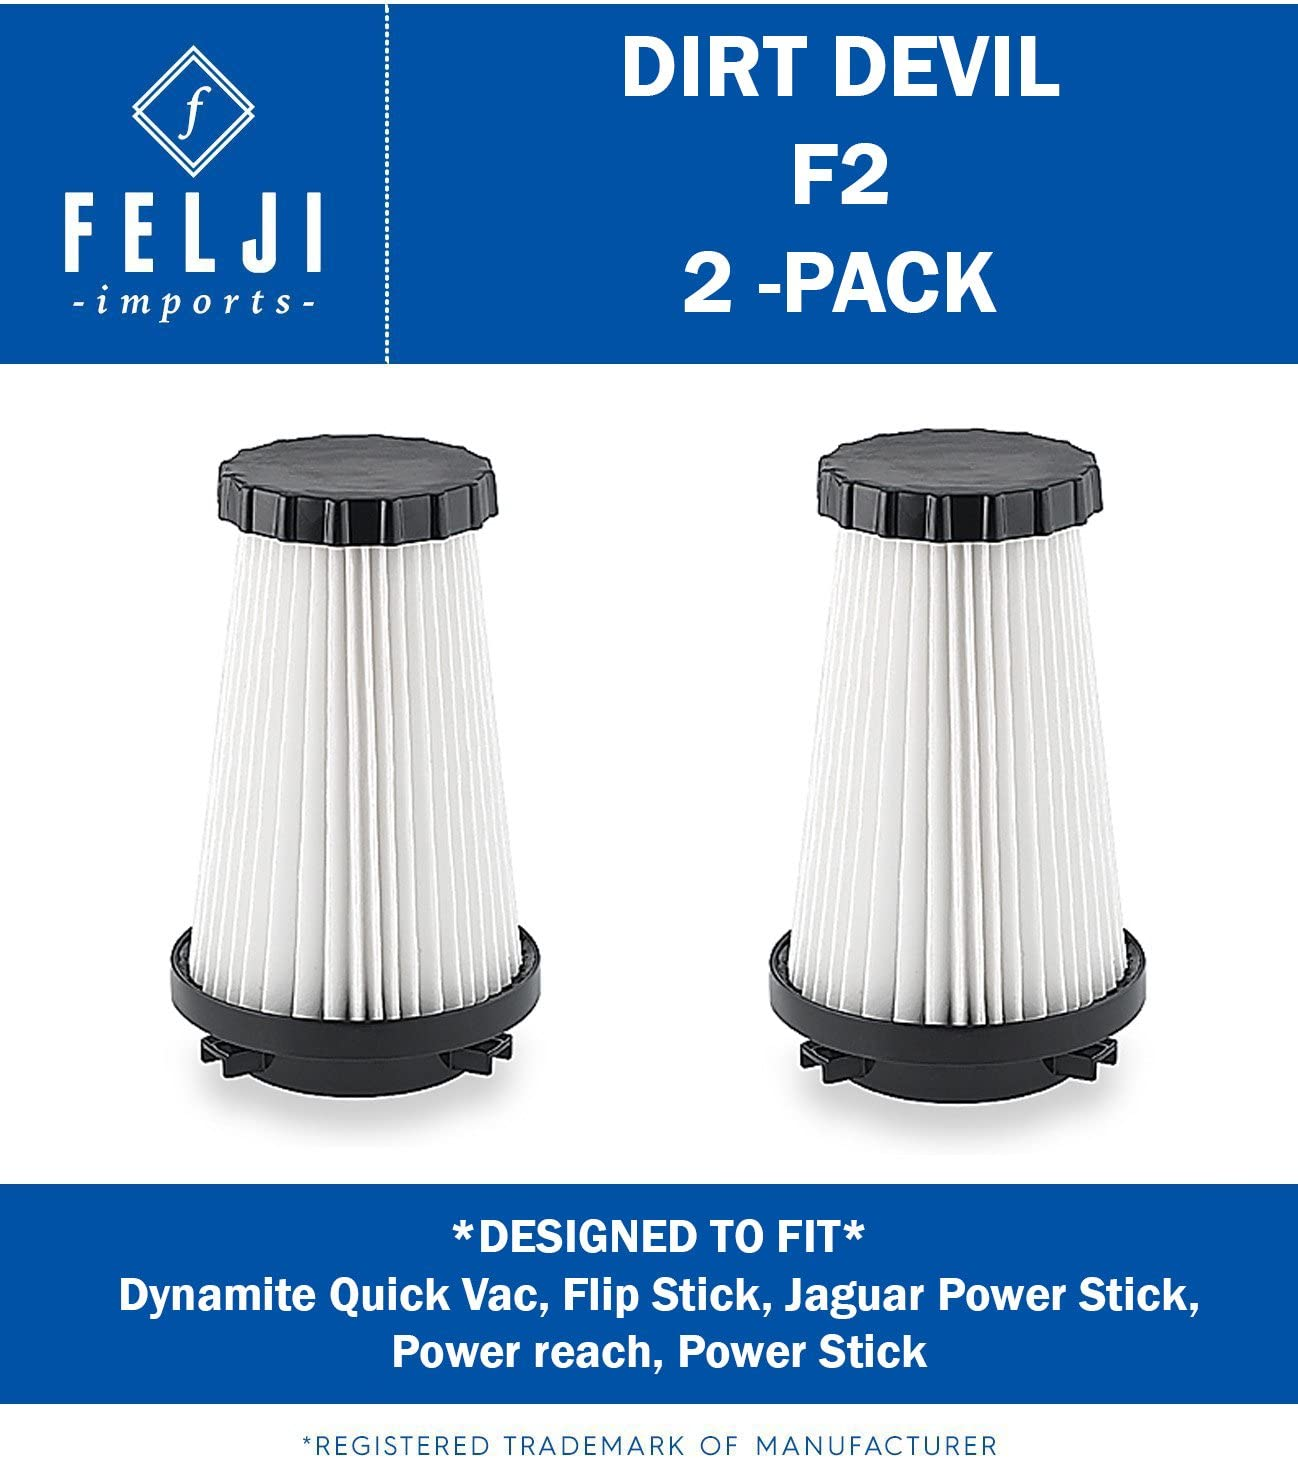 Felji Dirt Devil F2 Filter Replacement Part # 3SFA11500X 2SFA115000 42112-2 Pack